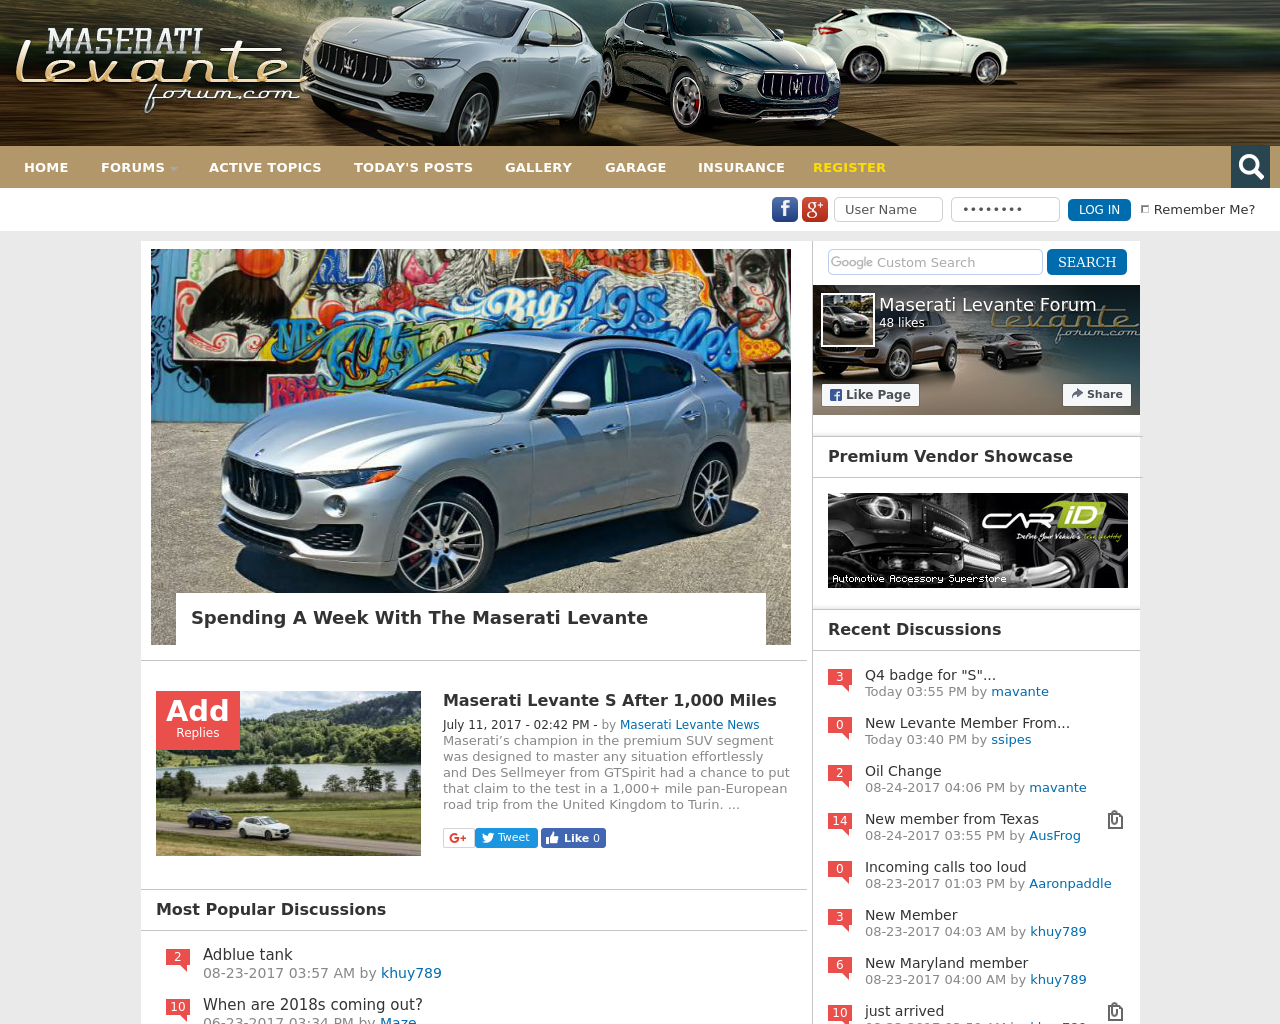 Maserati-Levante-Forum-Advertising-Reviews-Pricing